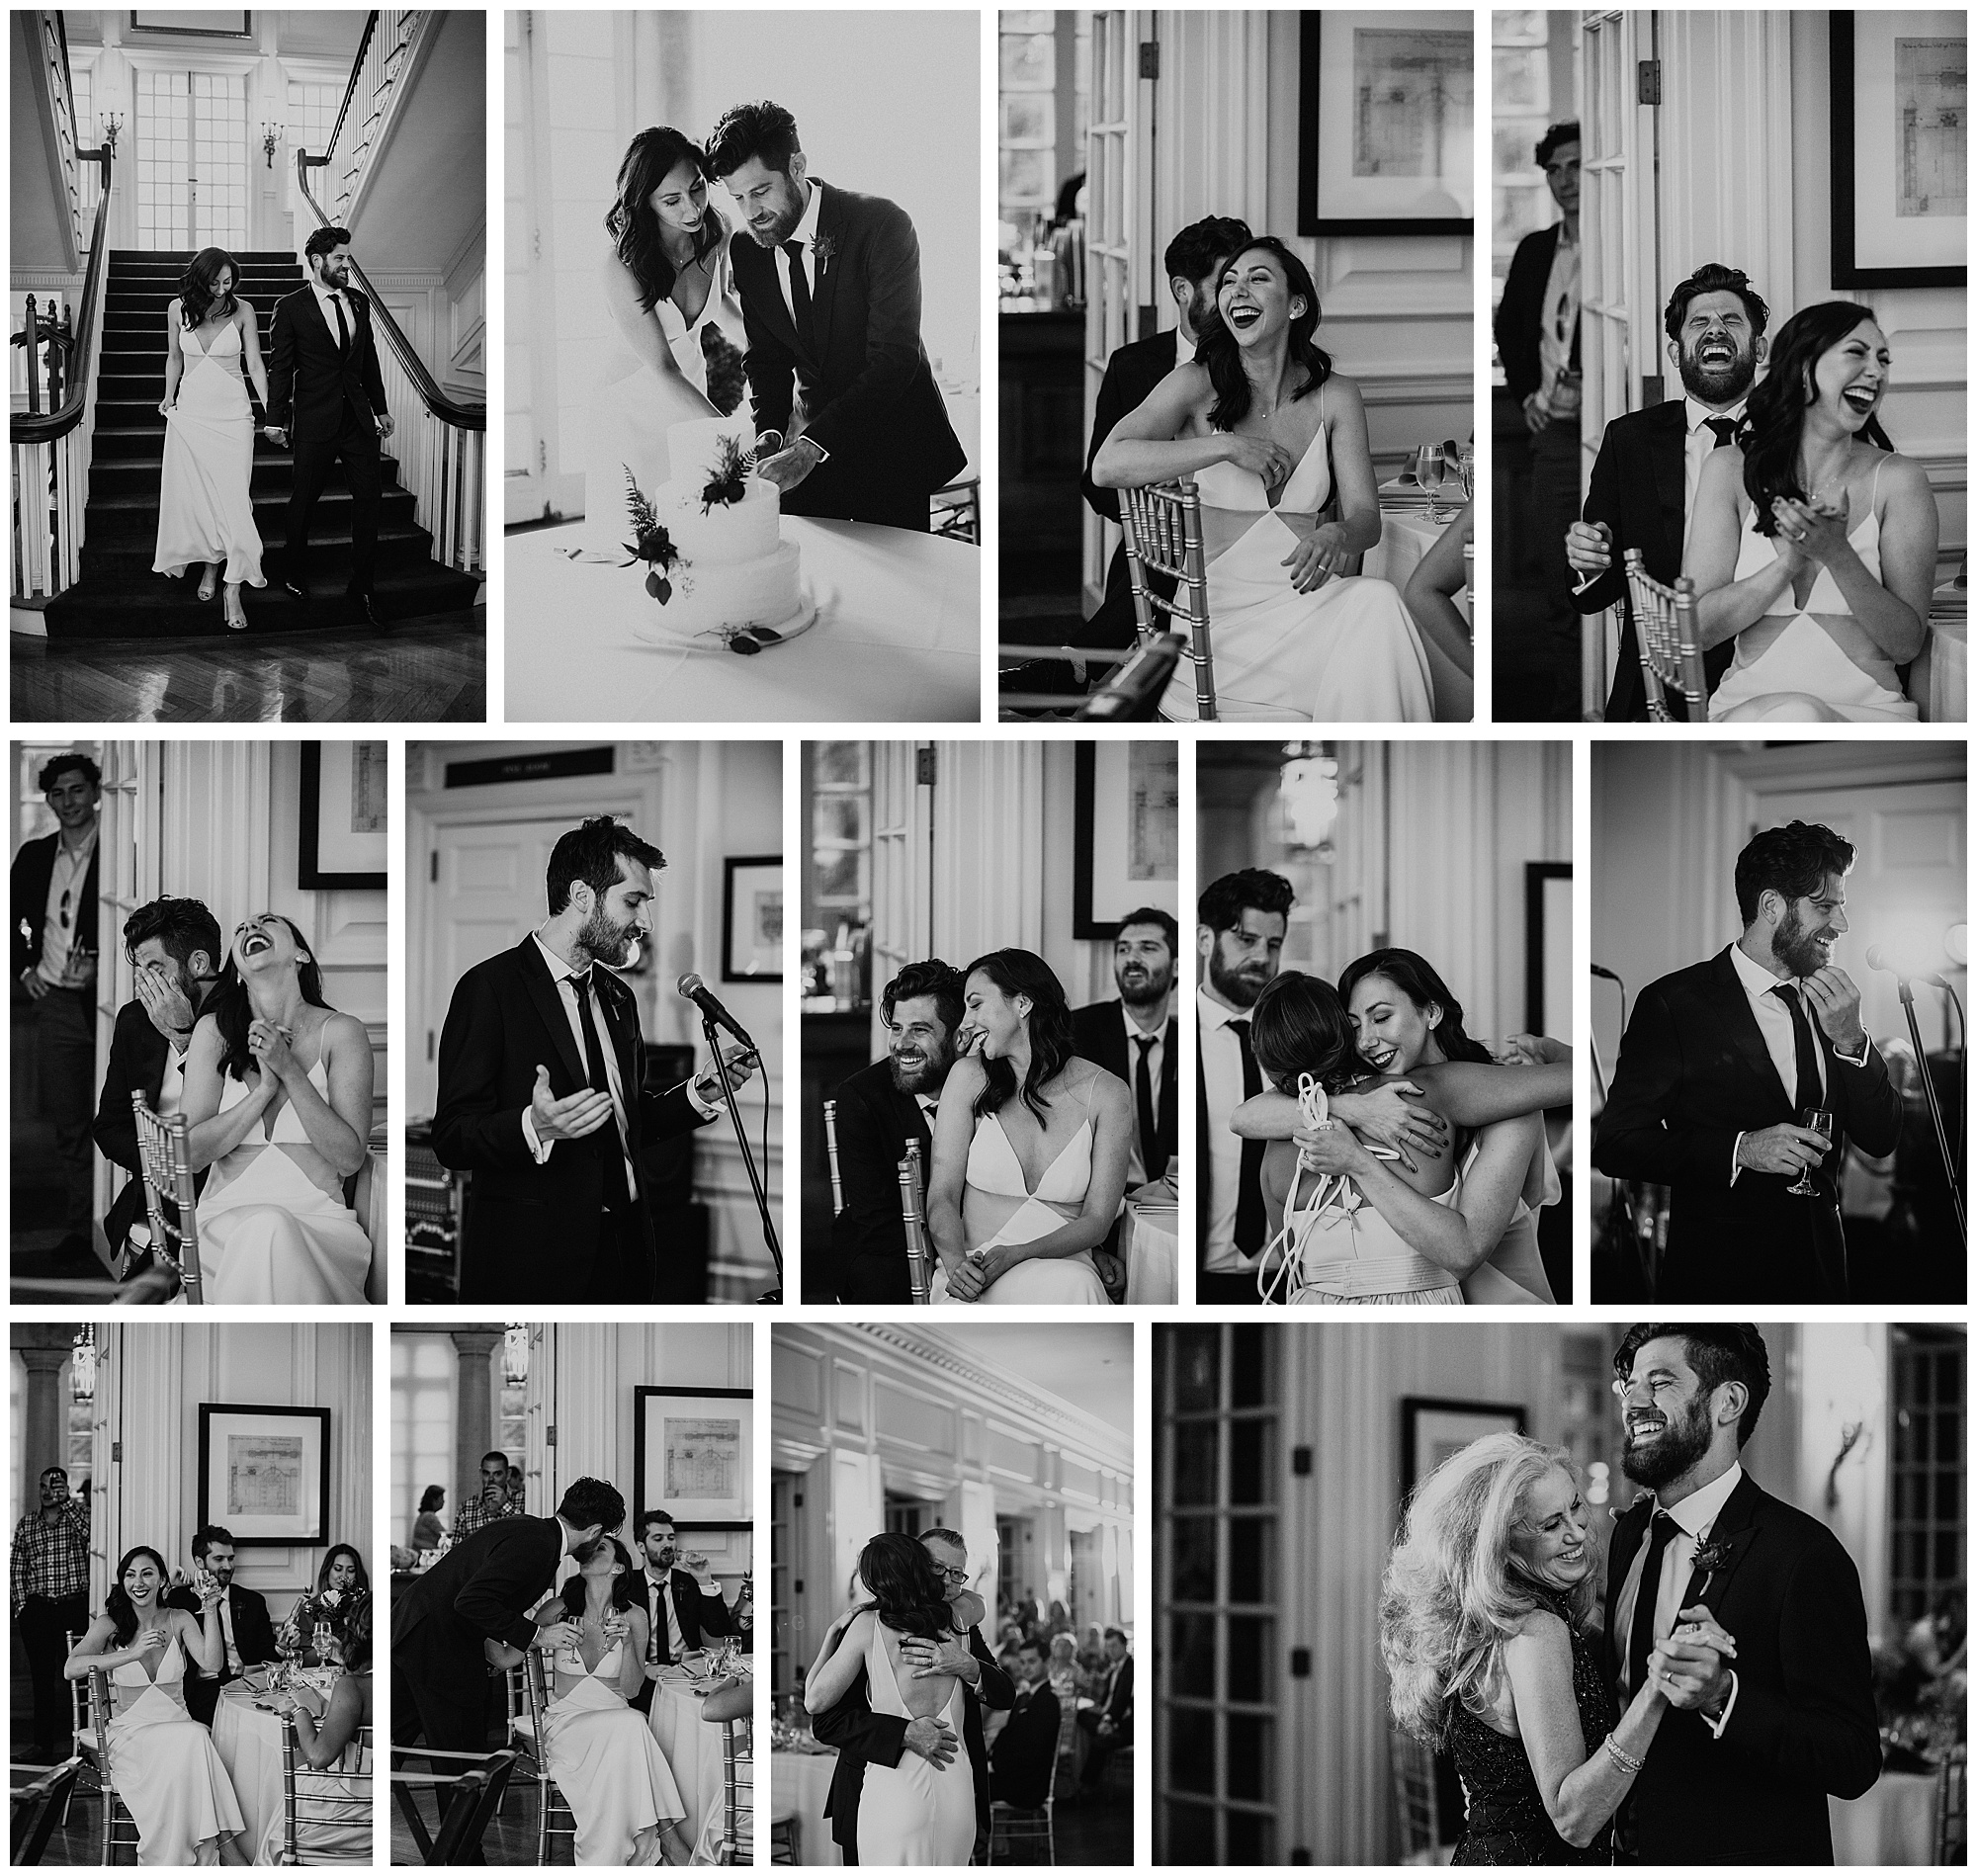 allerton_park_wedding_champaign_il_chicago_wright_photographs_ne_0037.jpg